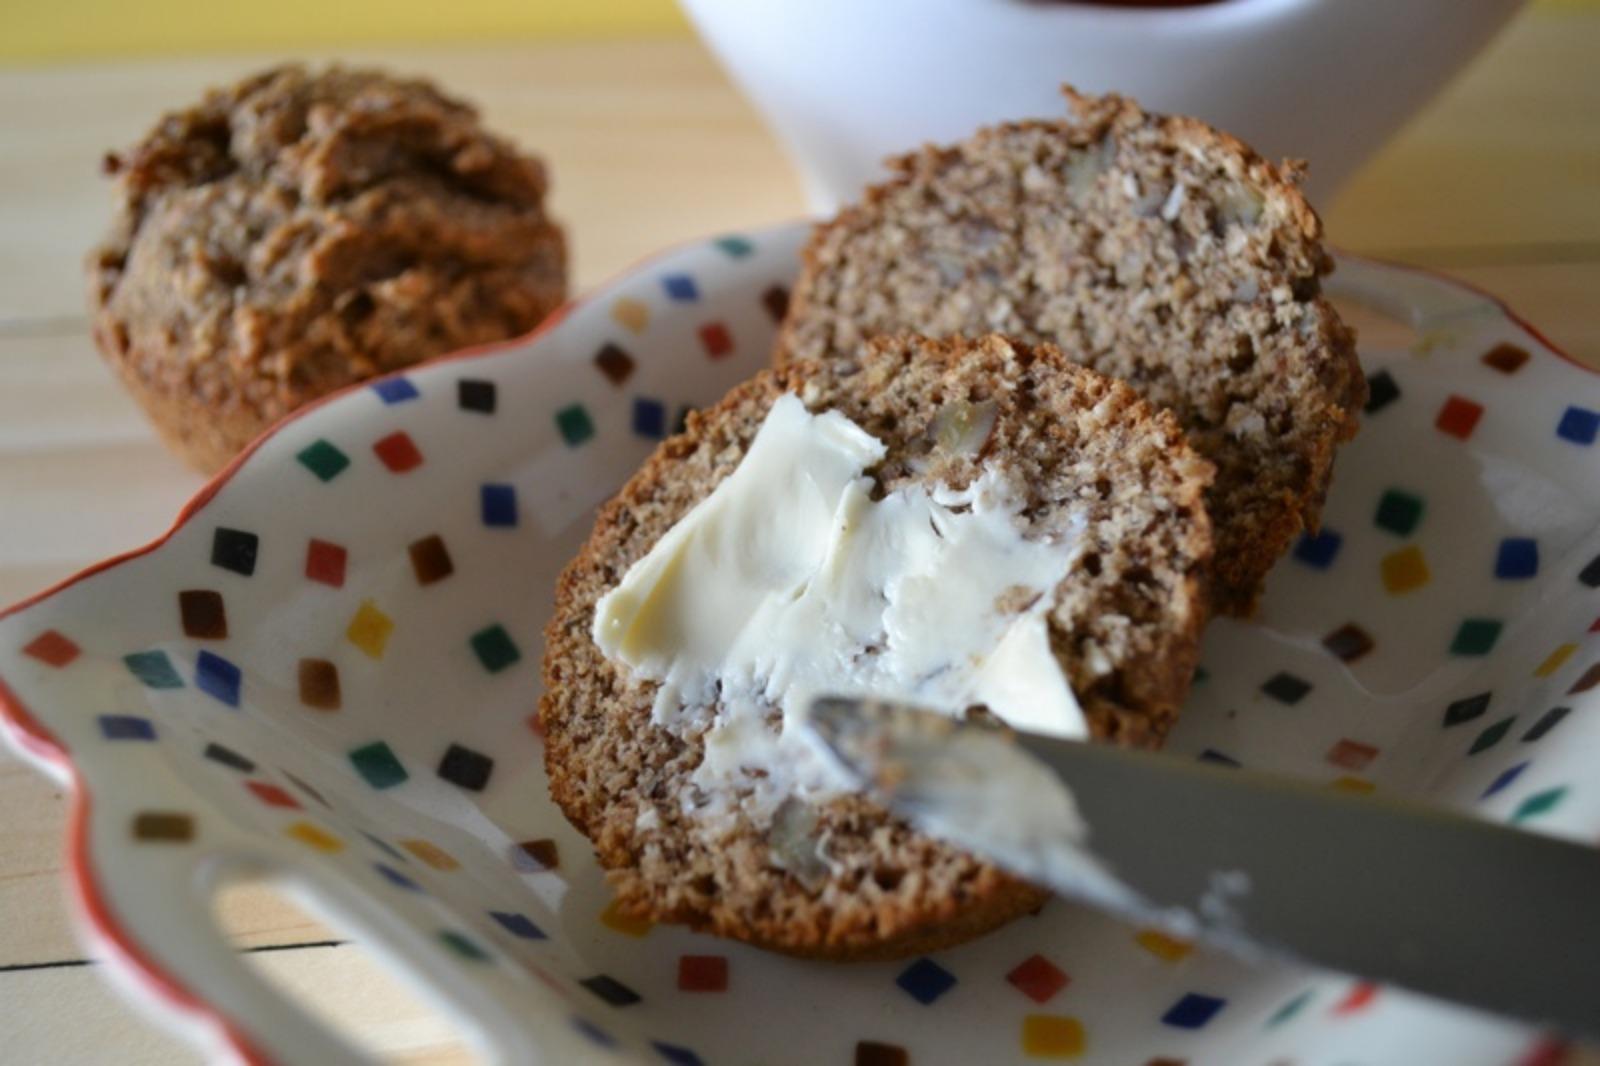 Banana Date flax muffins